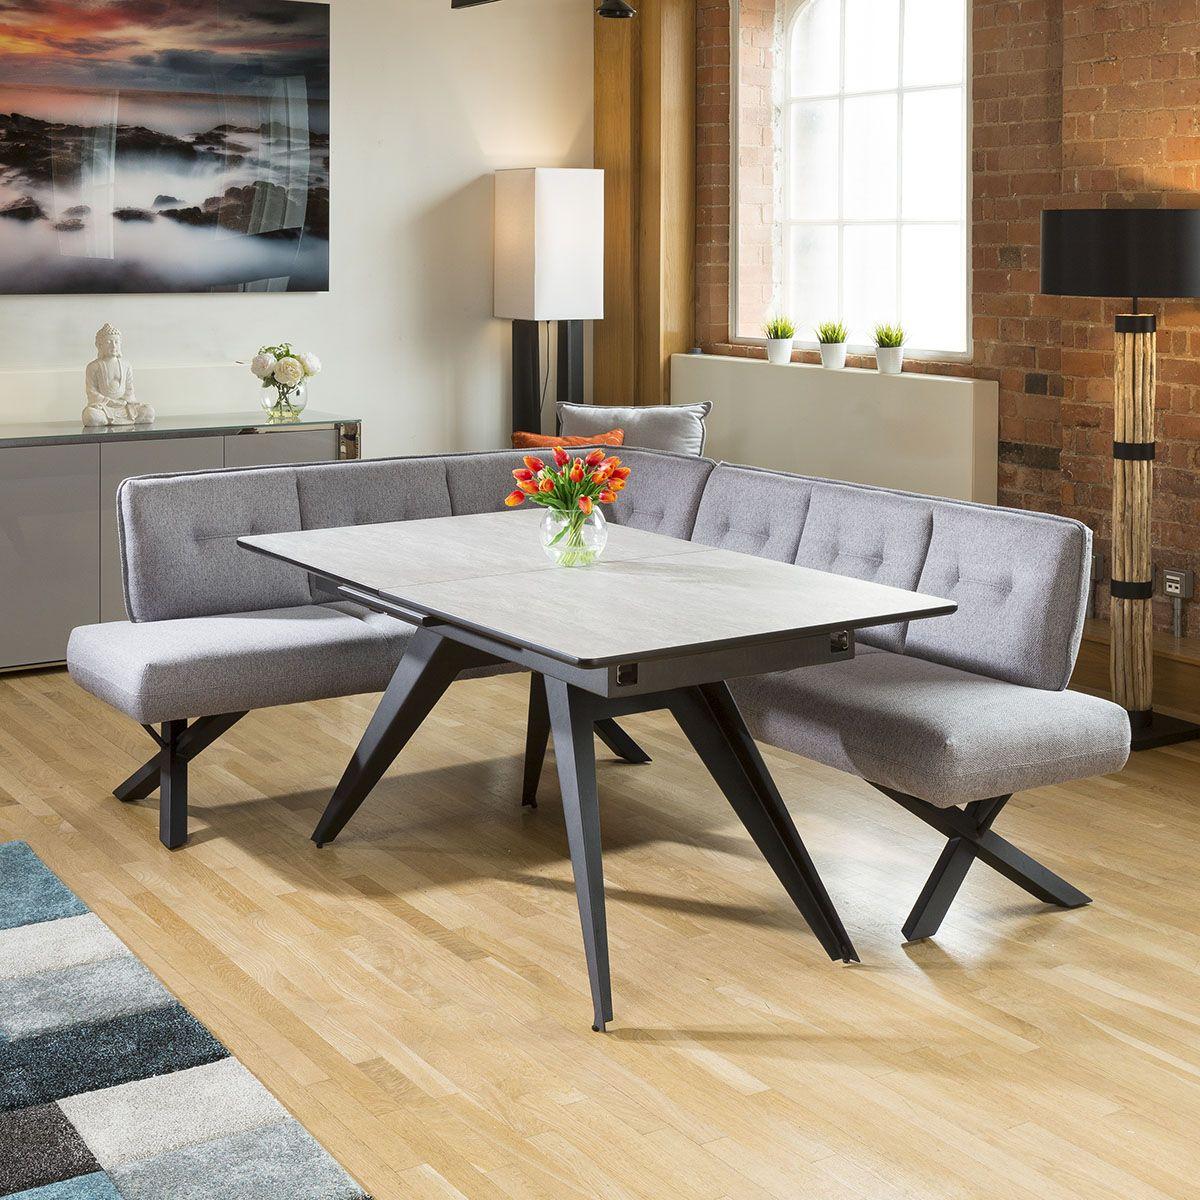 Extending Dining Table Concrete Melamine 6 Seater Grey Corner